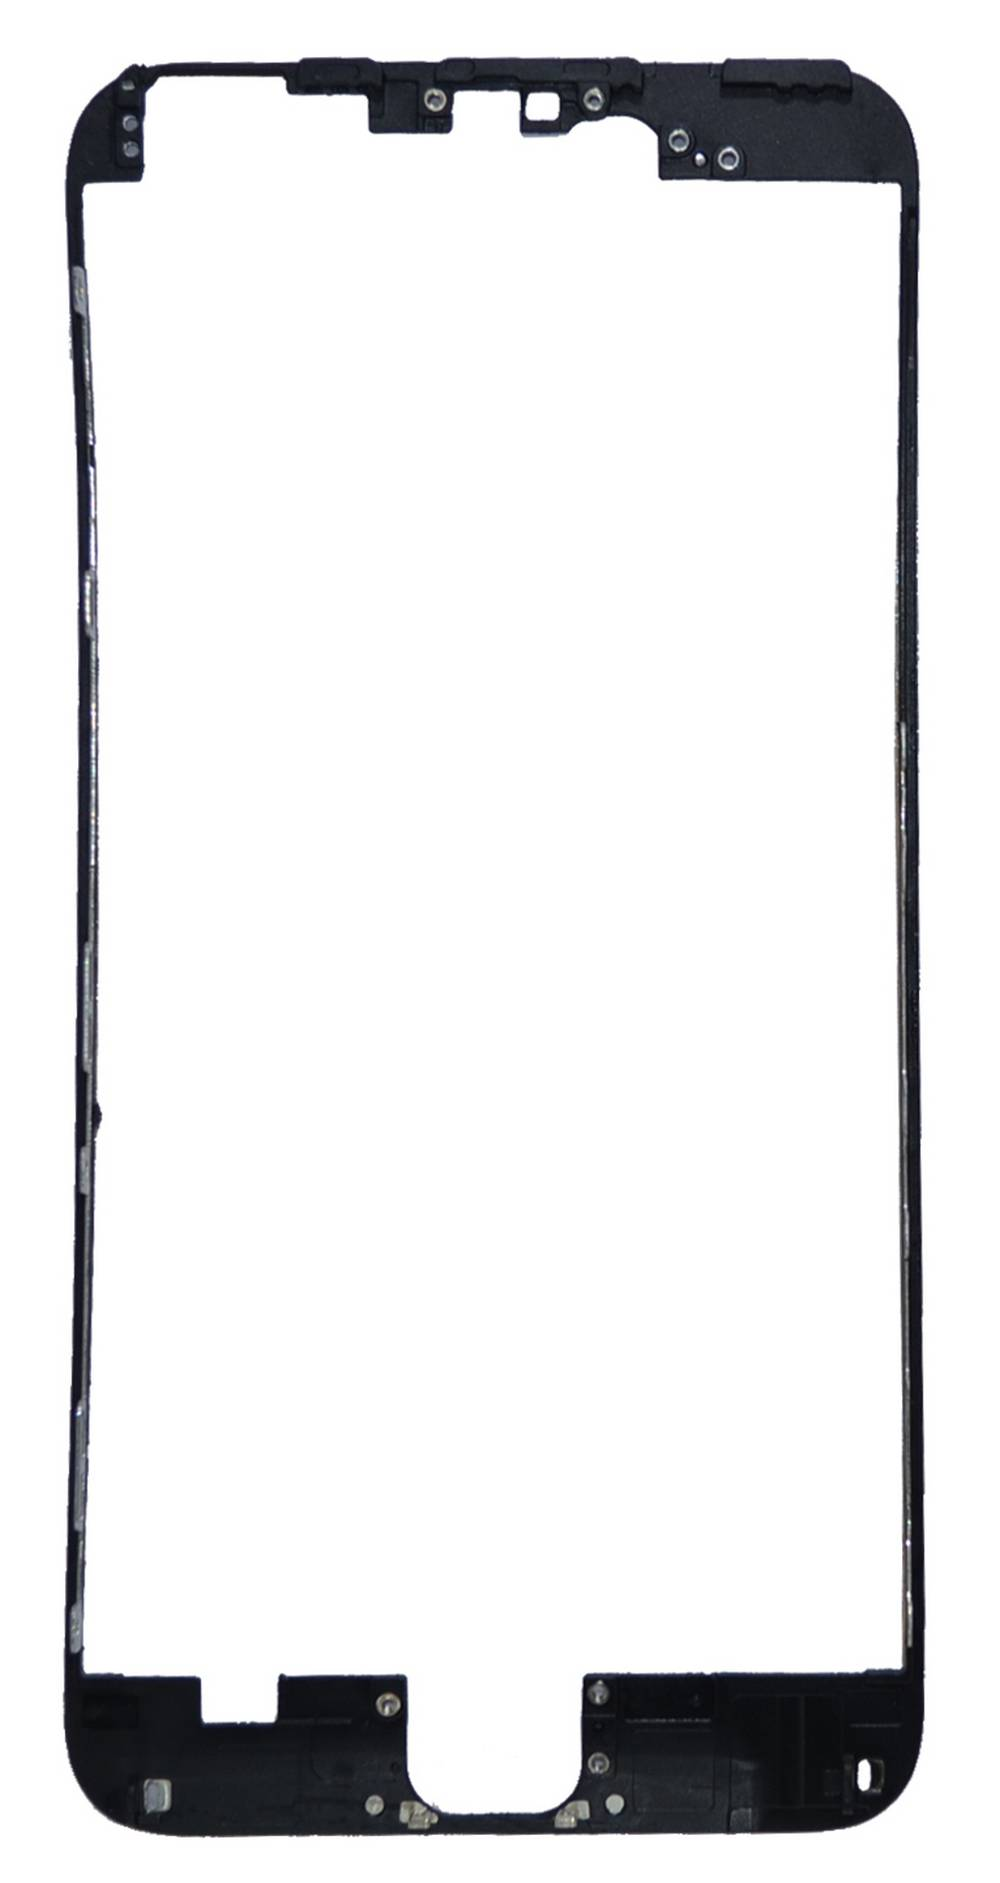 Gasket Οθόνης Apple iPhone 6 Plus Μαύρο OEM Type A